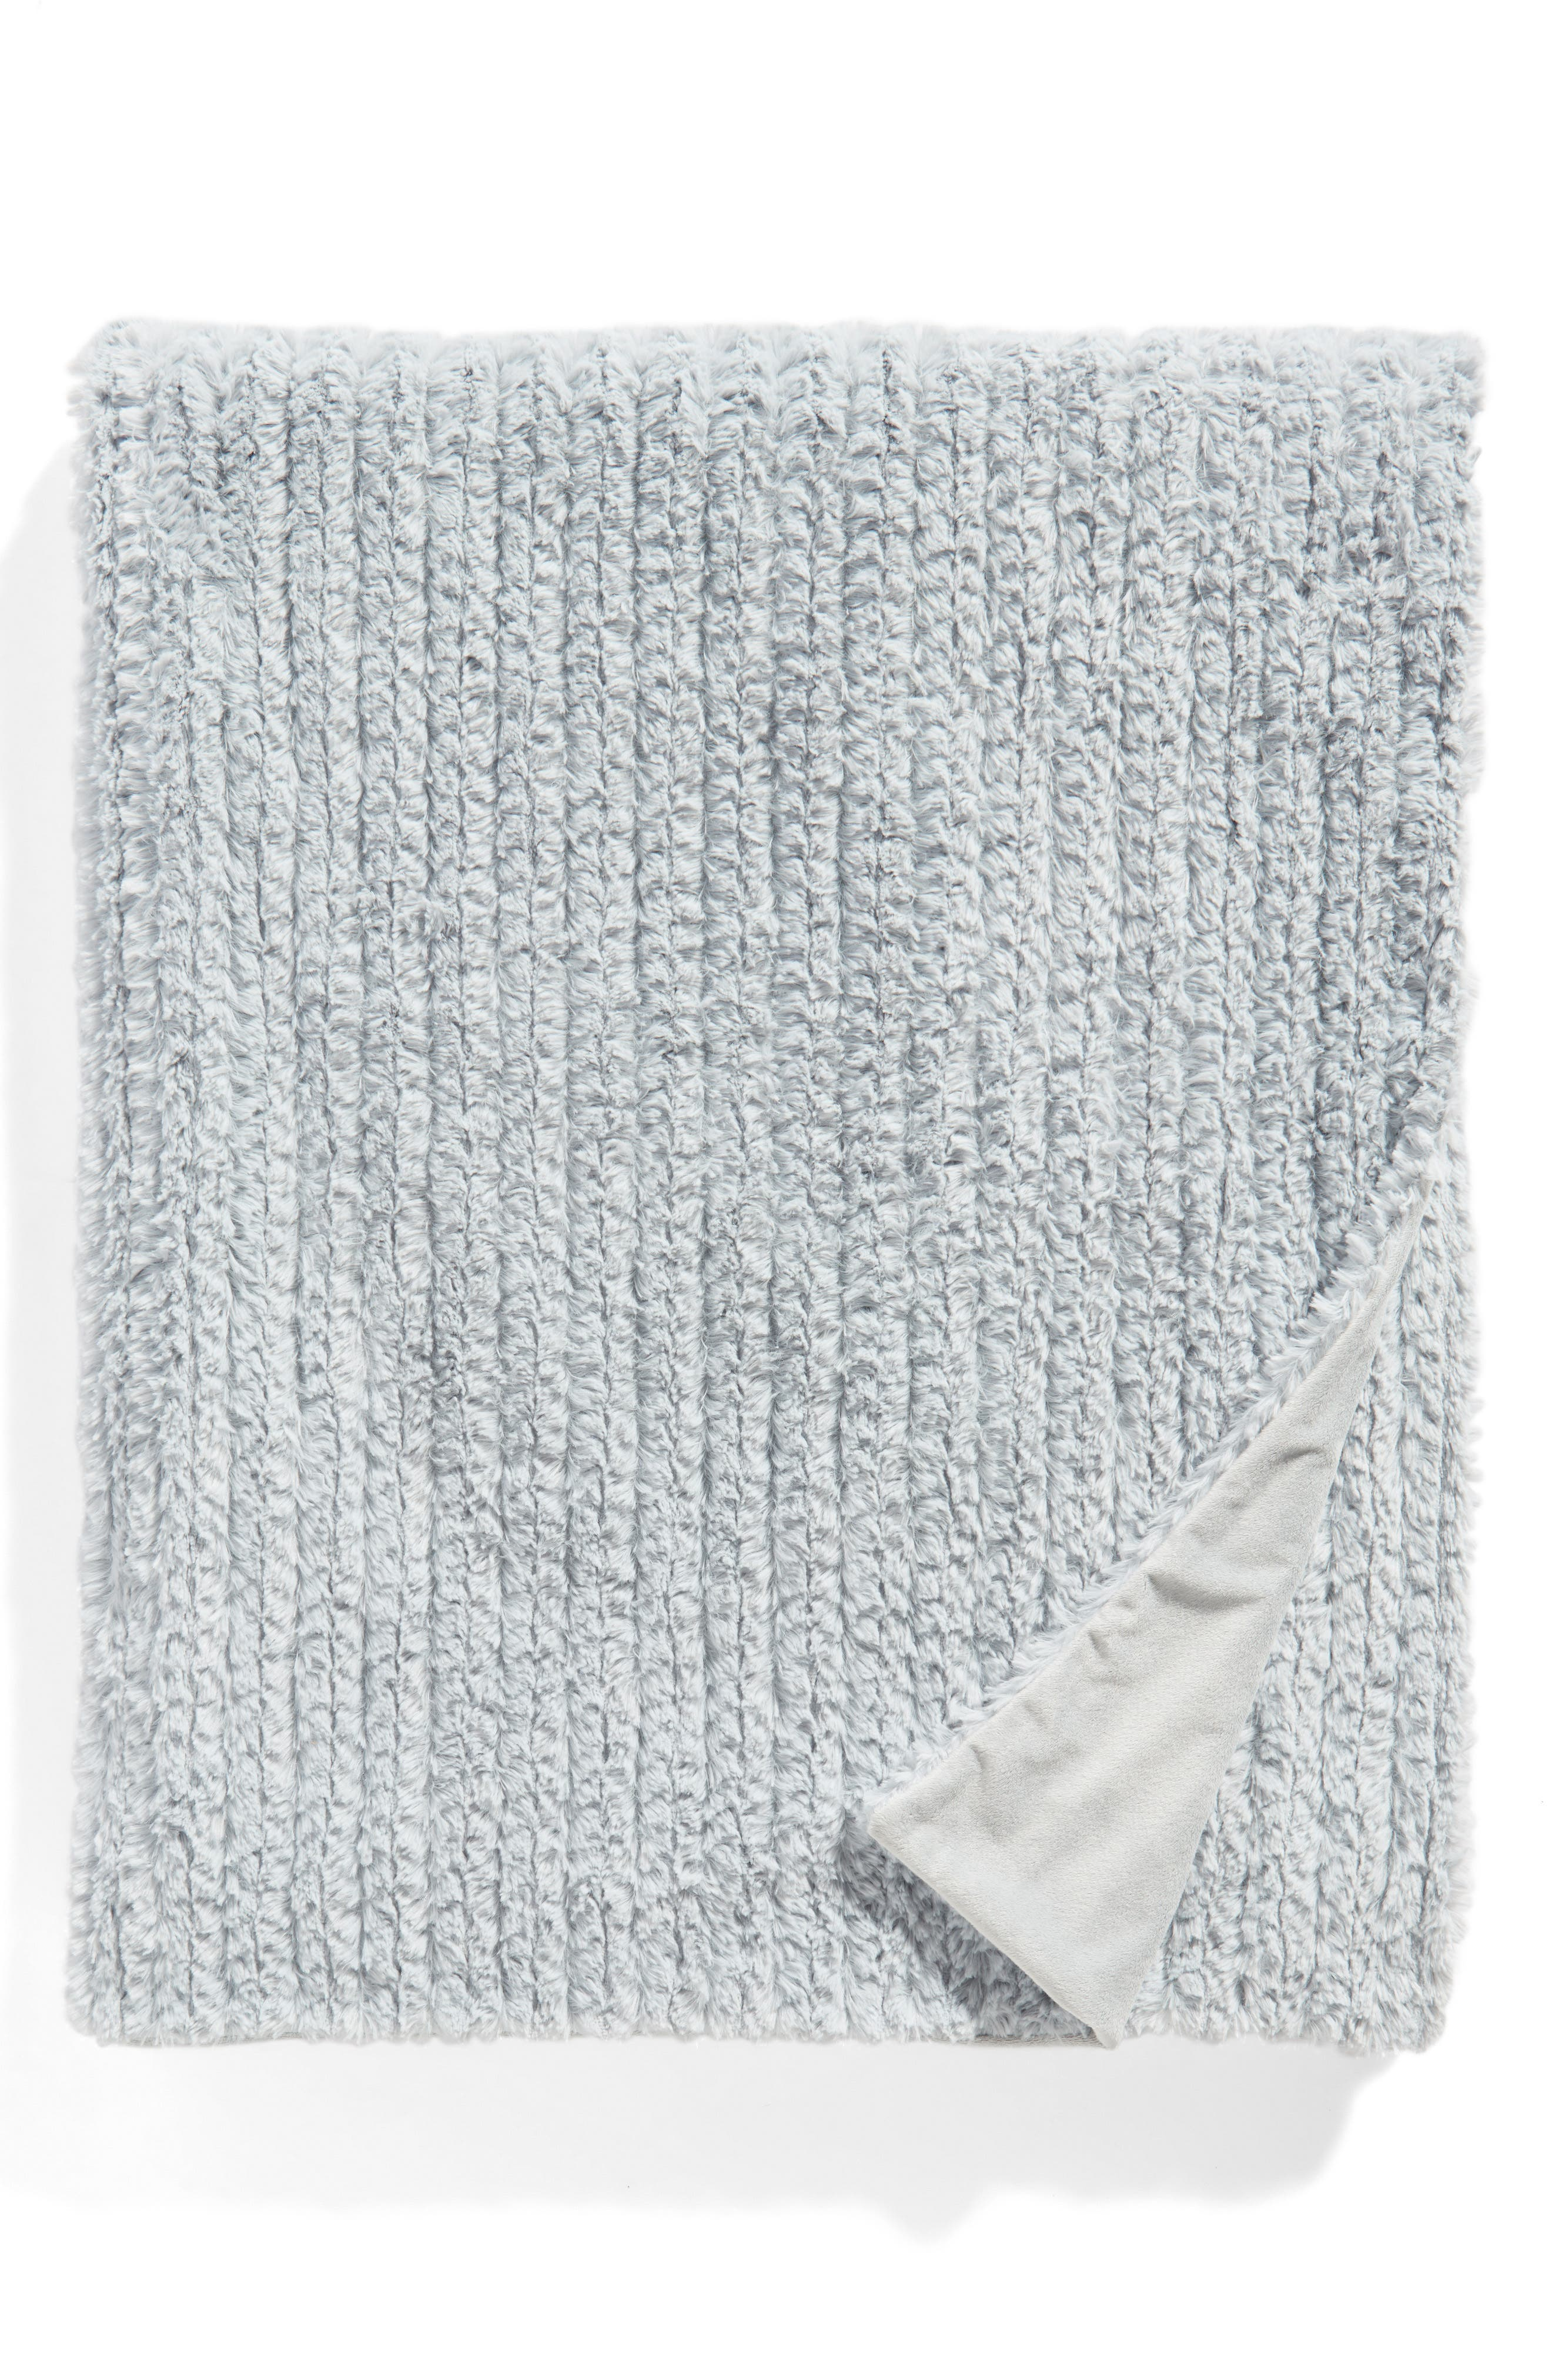 Nordstrom Cozy Plush Faux Fur Blanket